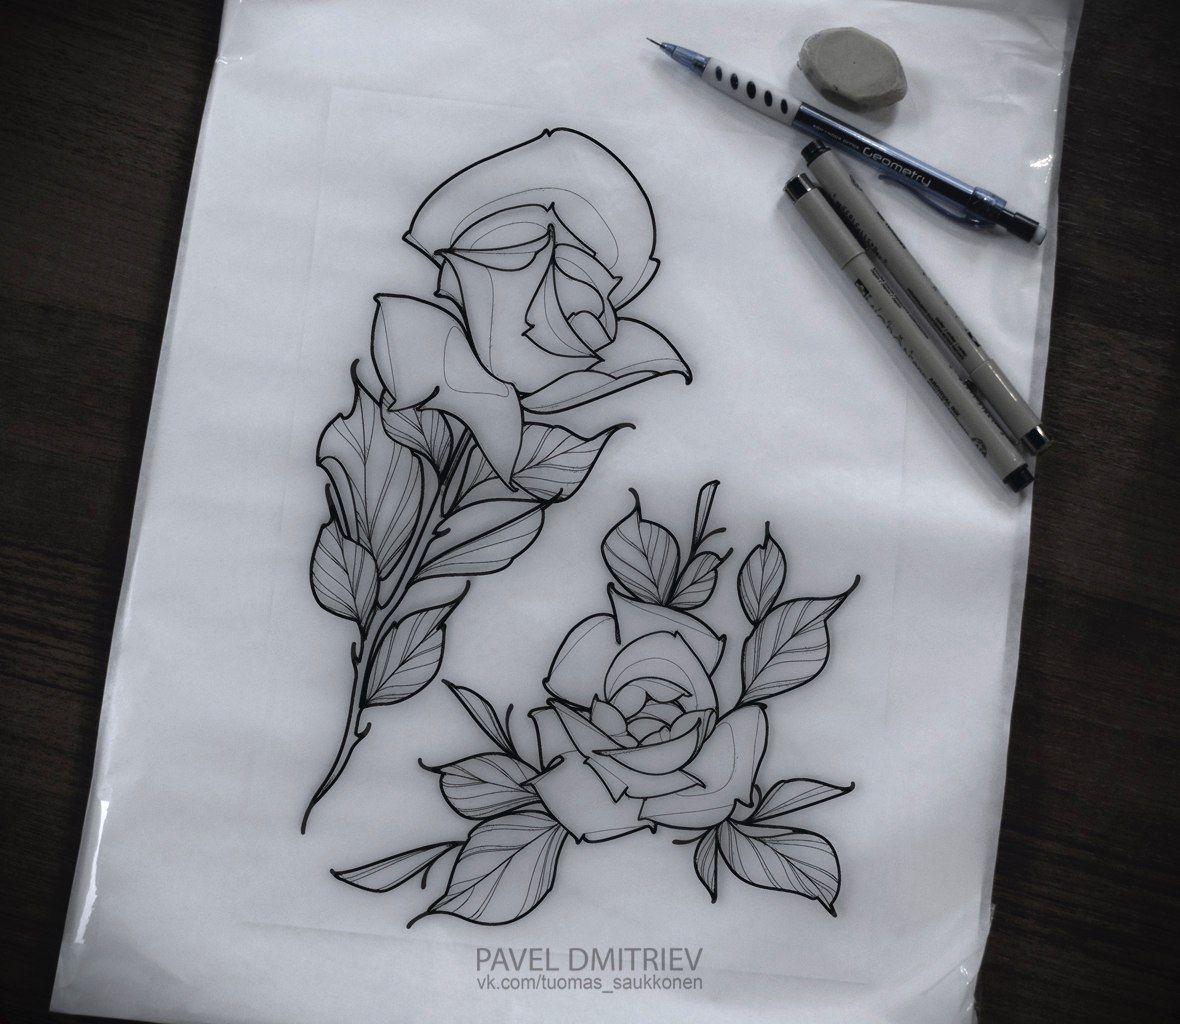 Pavel Dmitriev Blackwork Blackworkers Tattoo Dotwork Linework Blacktattoo Neotraditional Portrait Drawin Flower Tattoo Designs Tattoos Peony Drawing